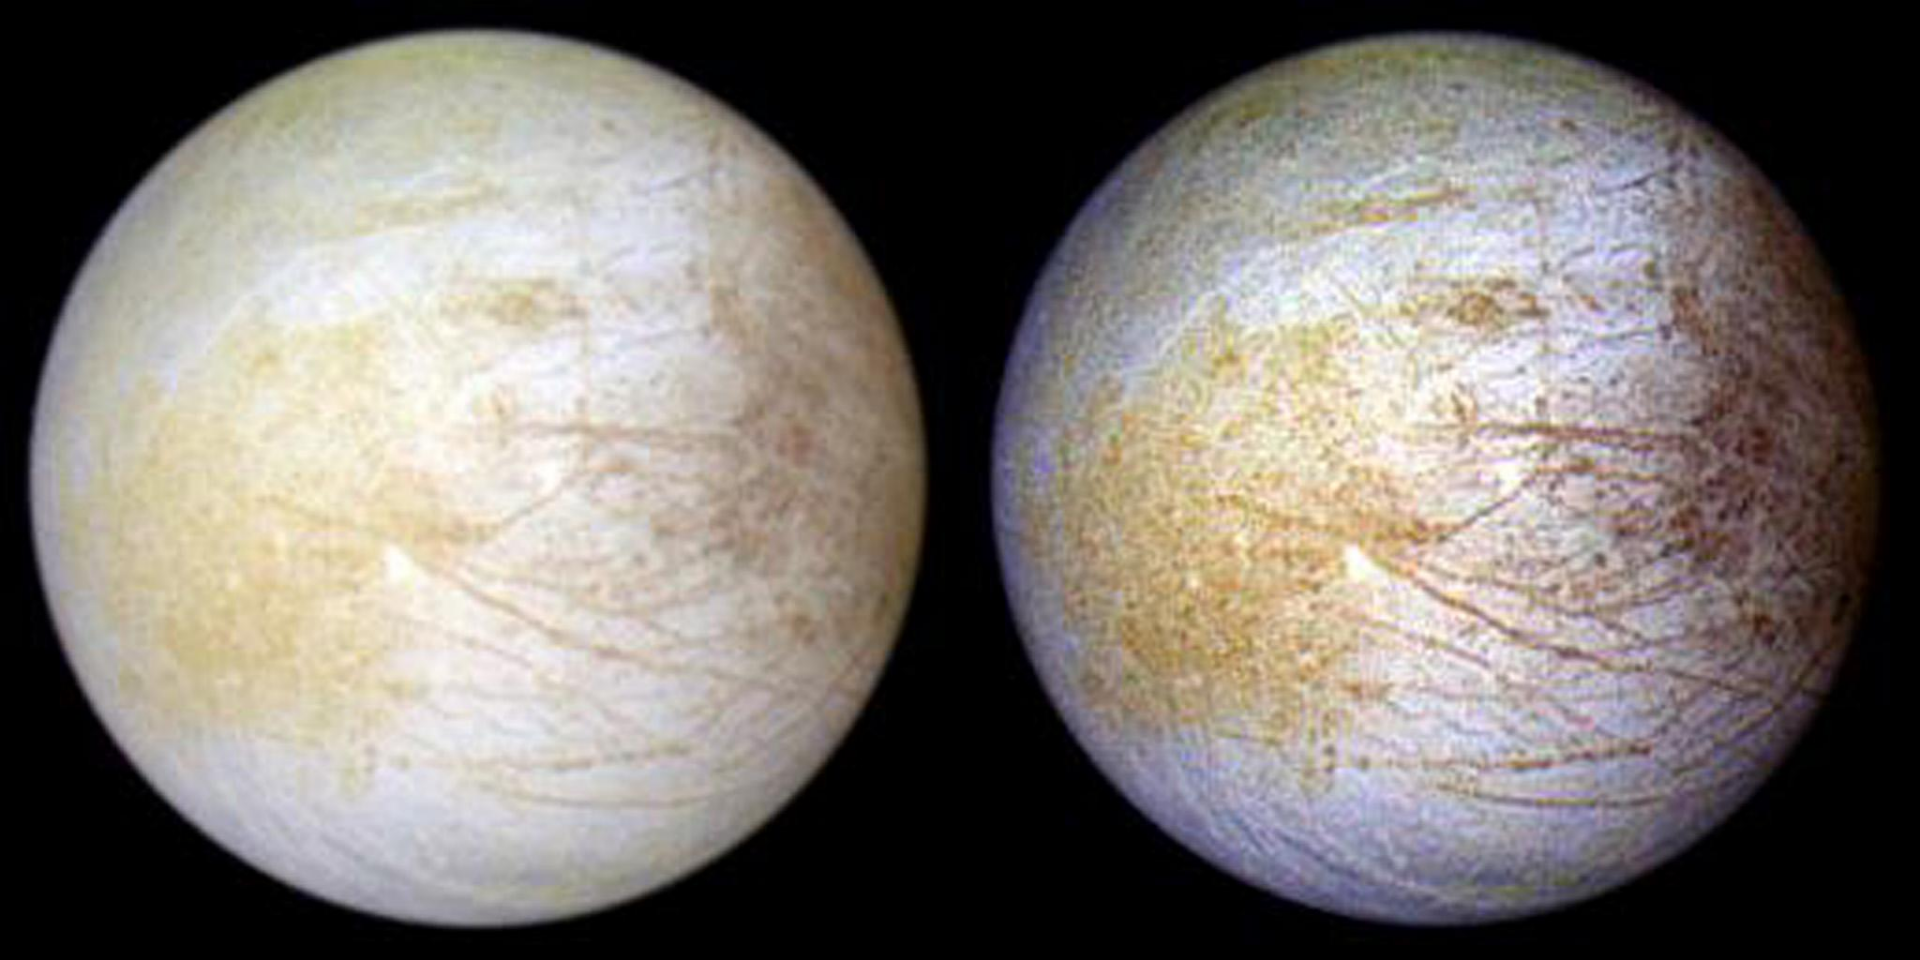 NASA detects water vapor on Jupiter's moon Europa